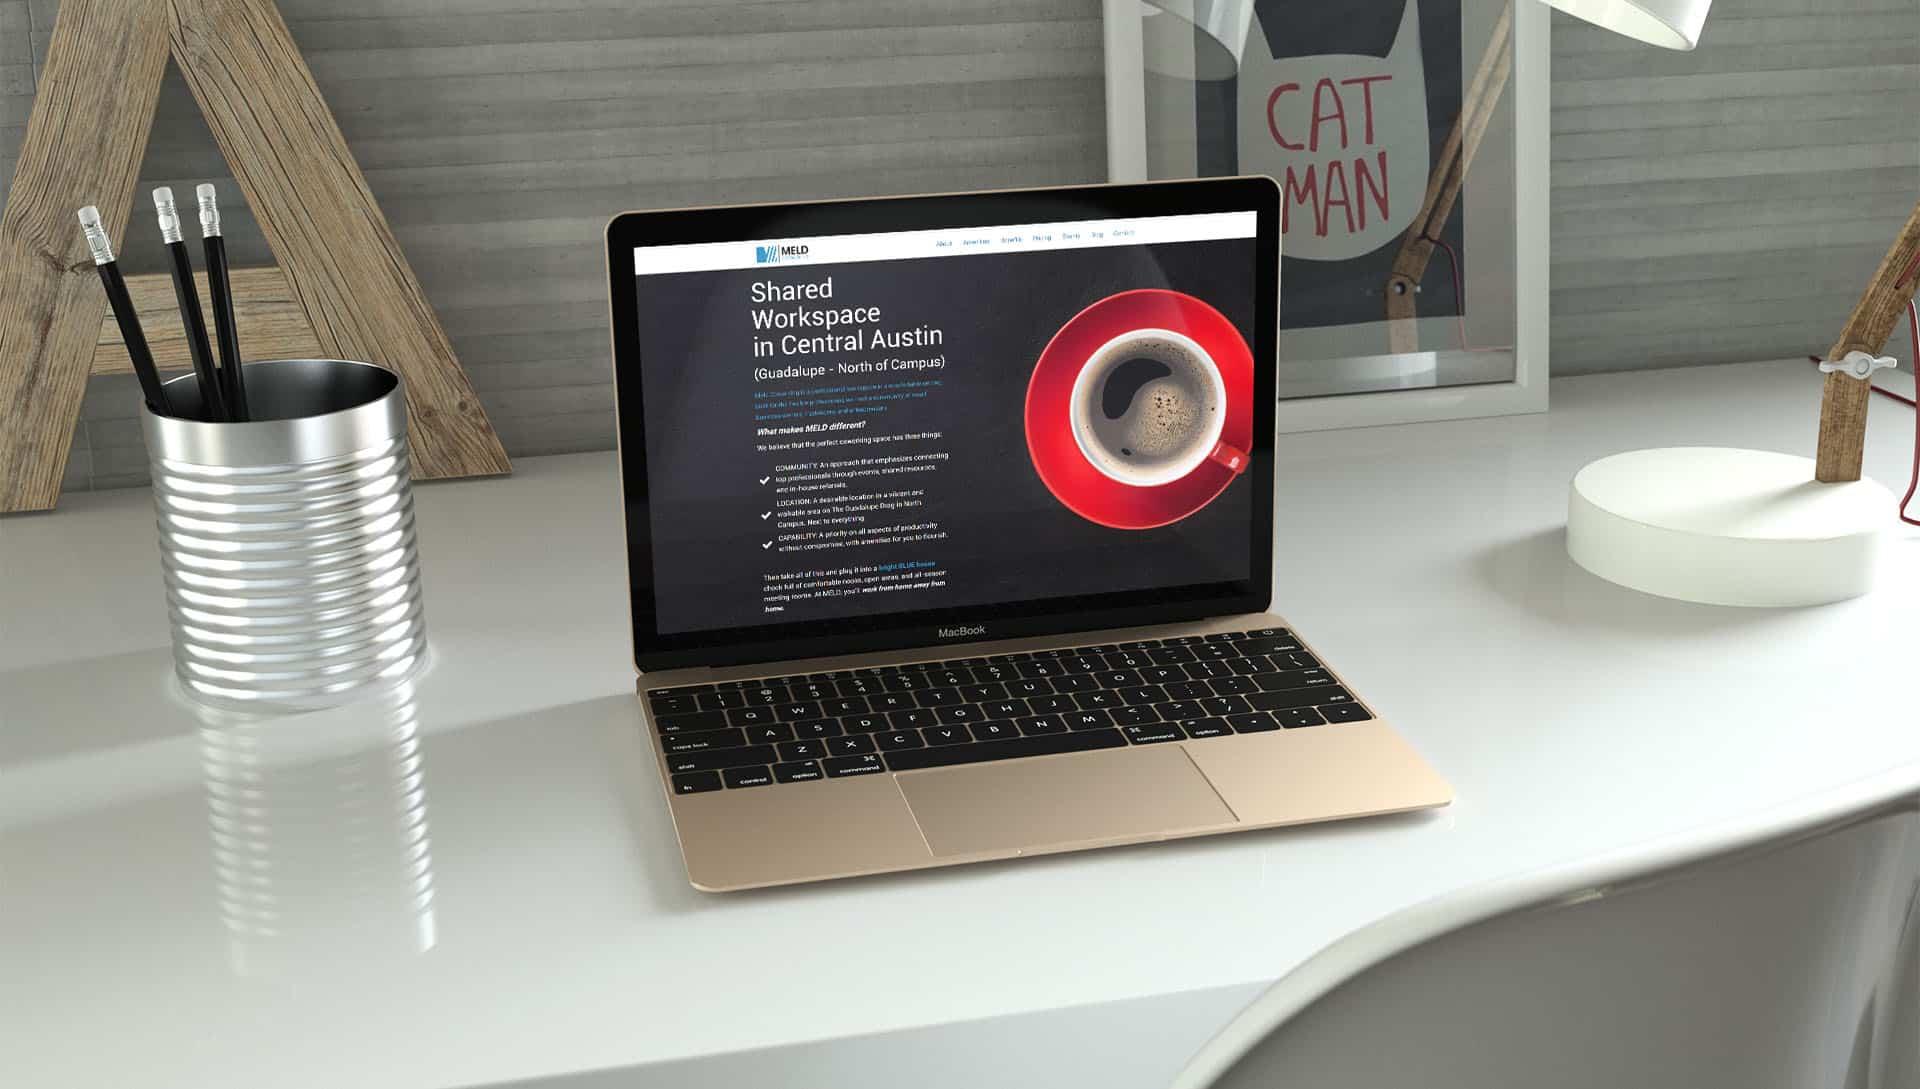 Shared Workspace In Central Austin Website Design